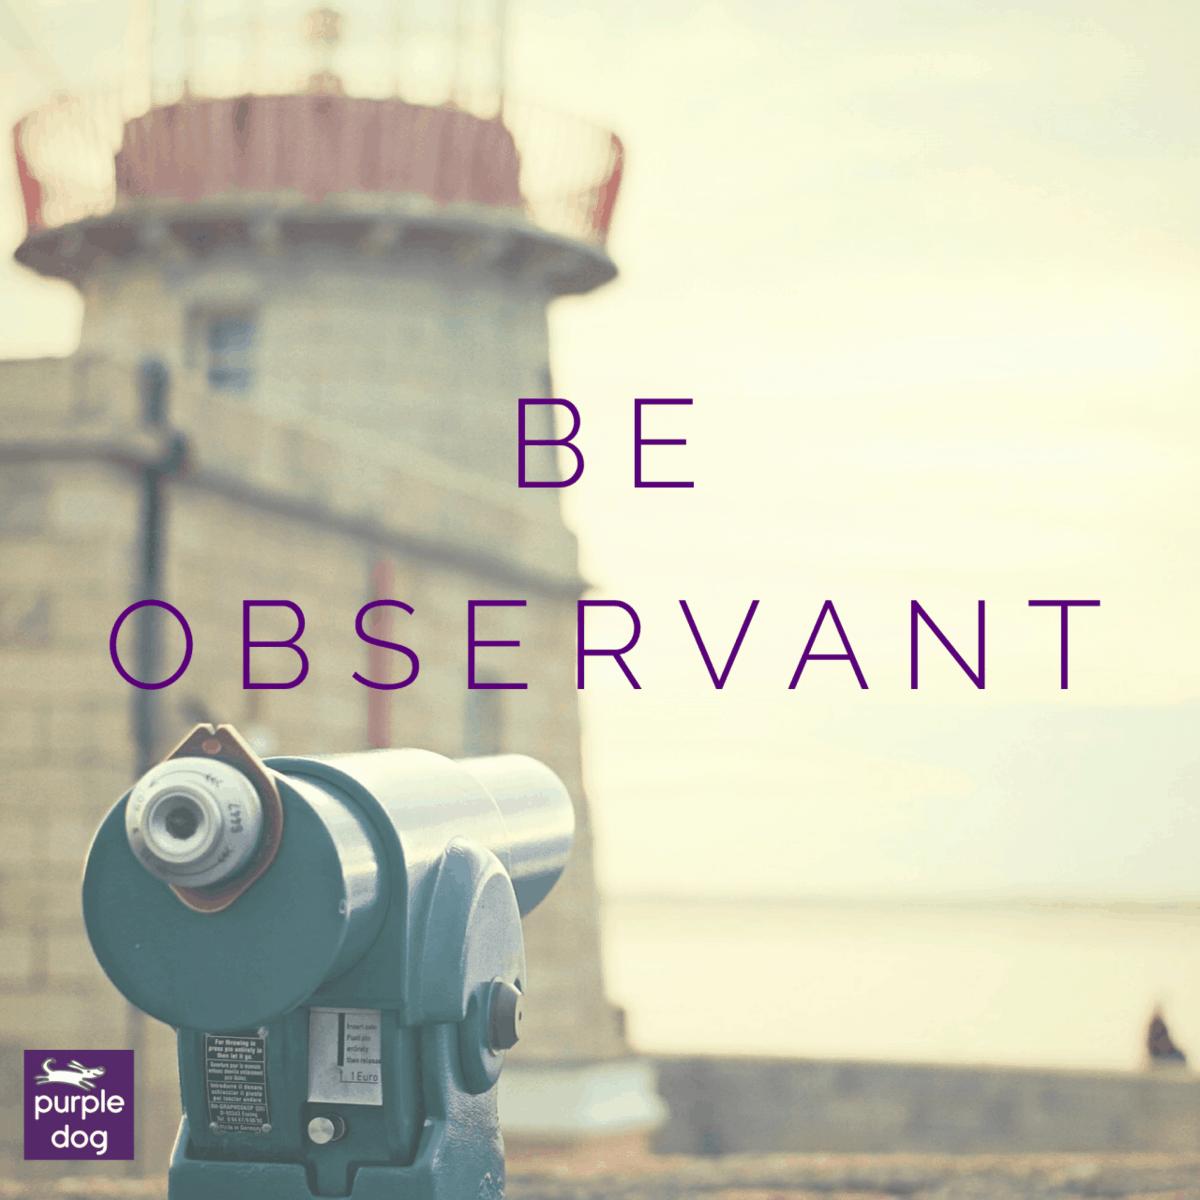 Be observant